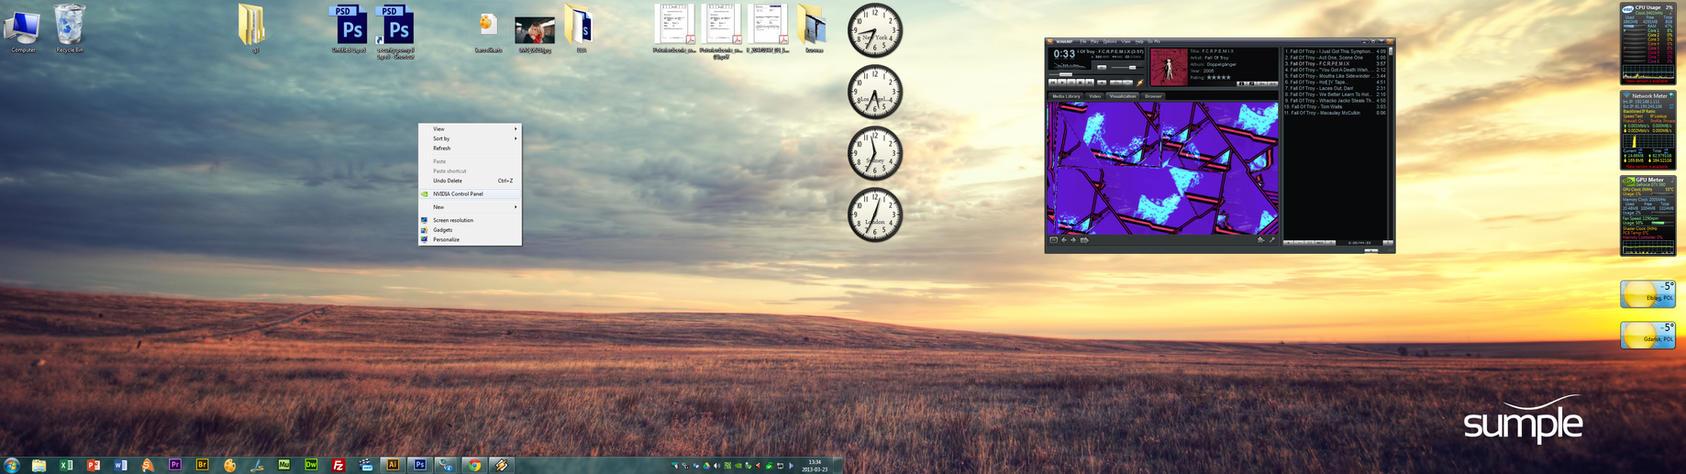 Desktop 2013 by sumowski